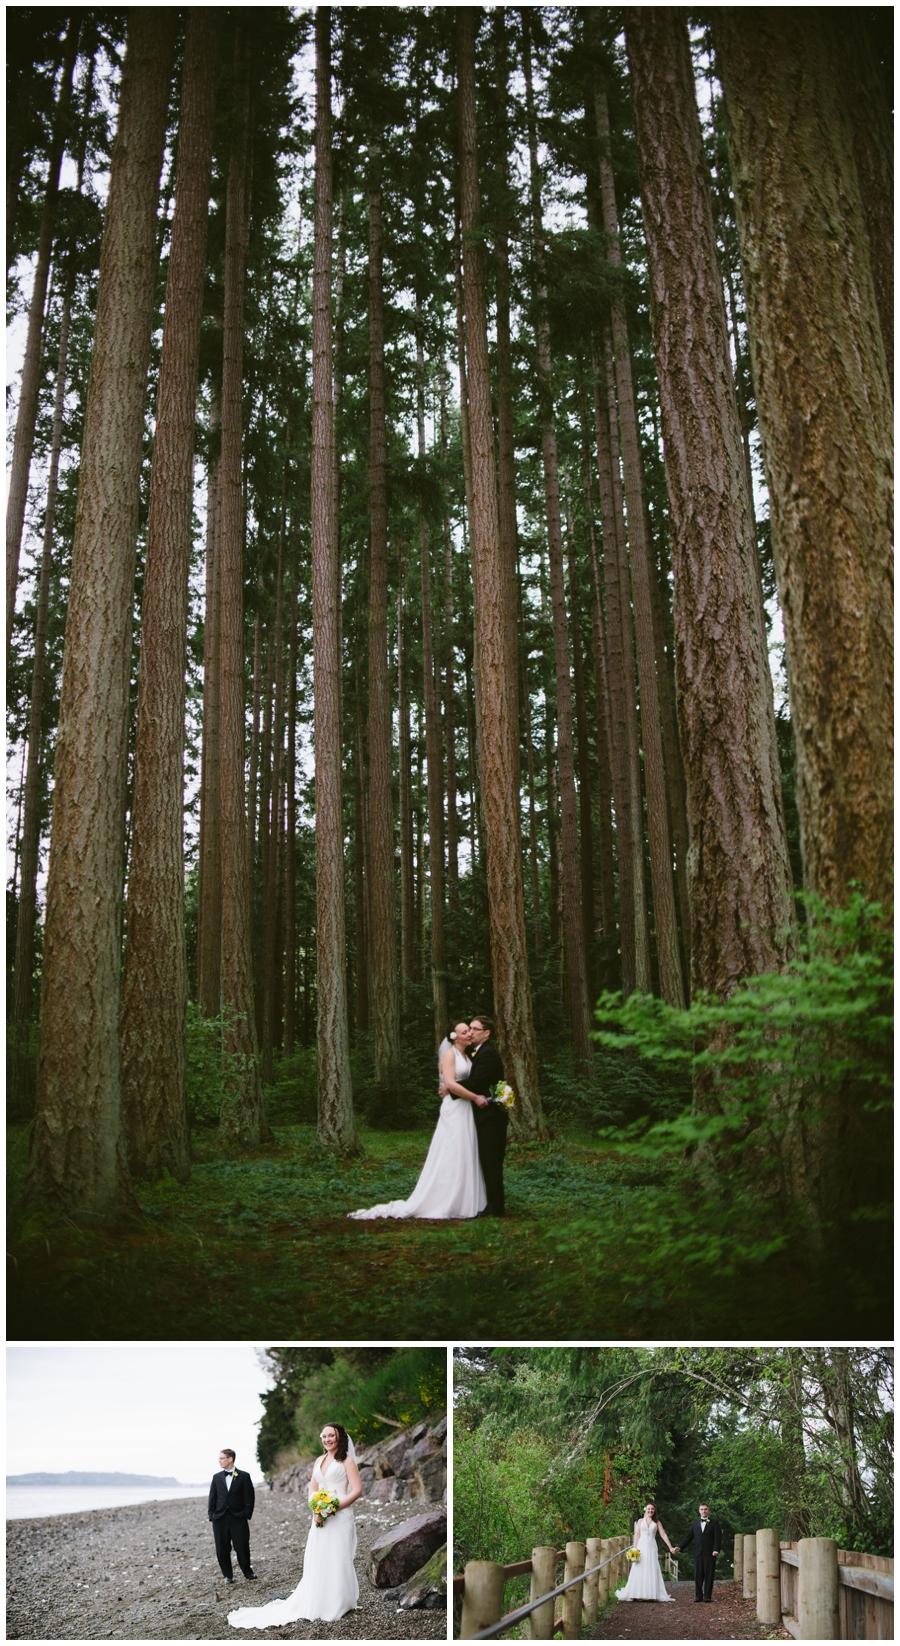 Kitsap State Memorial Park - photo Rennardphotography